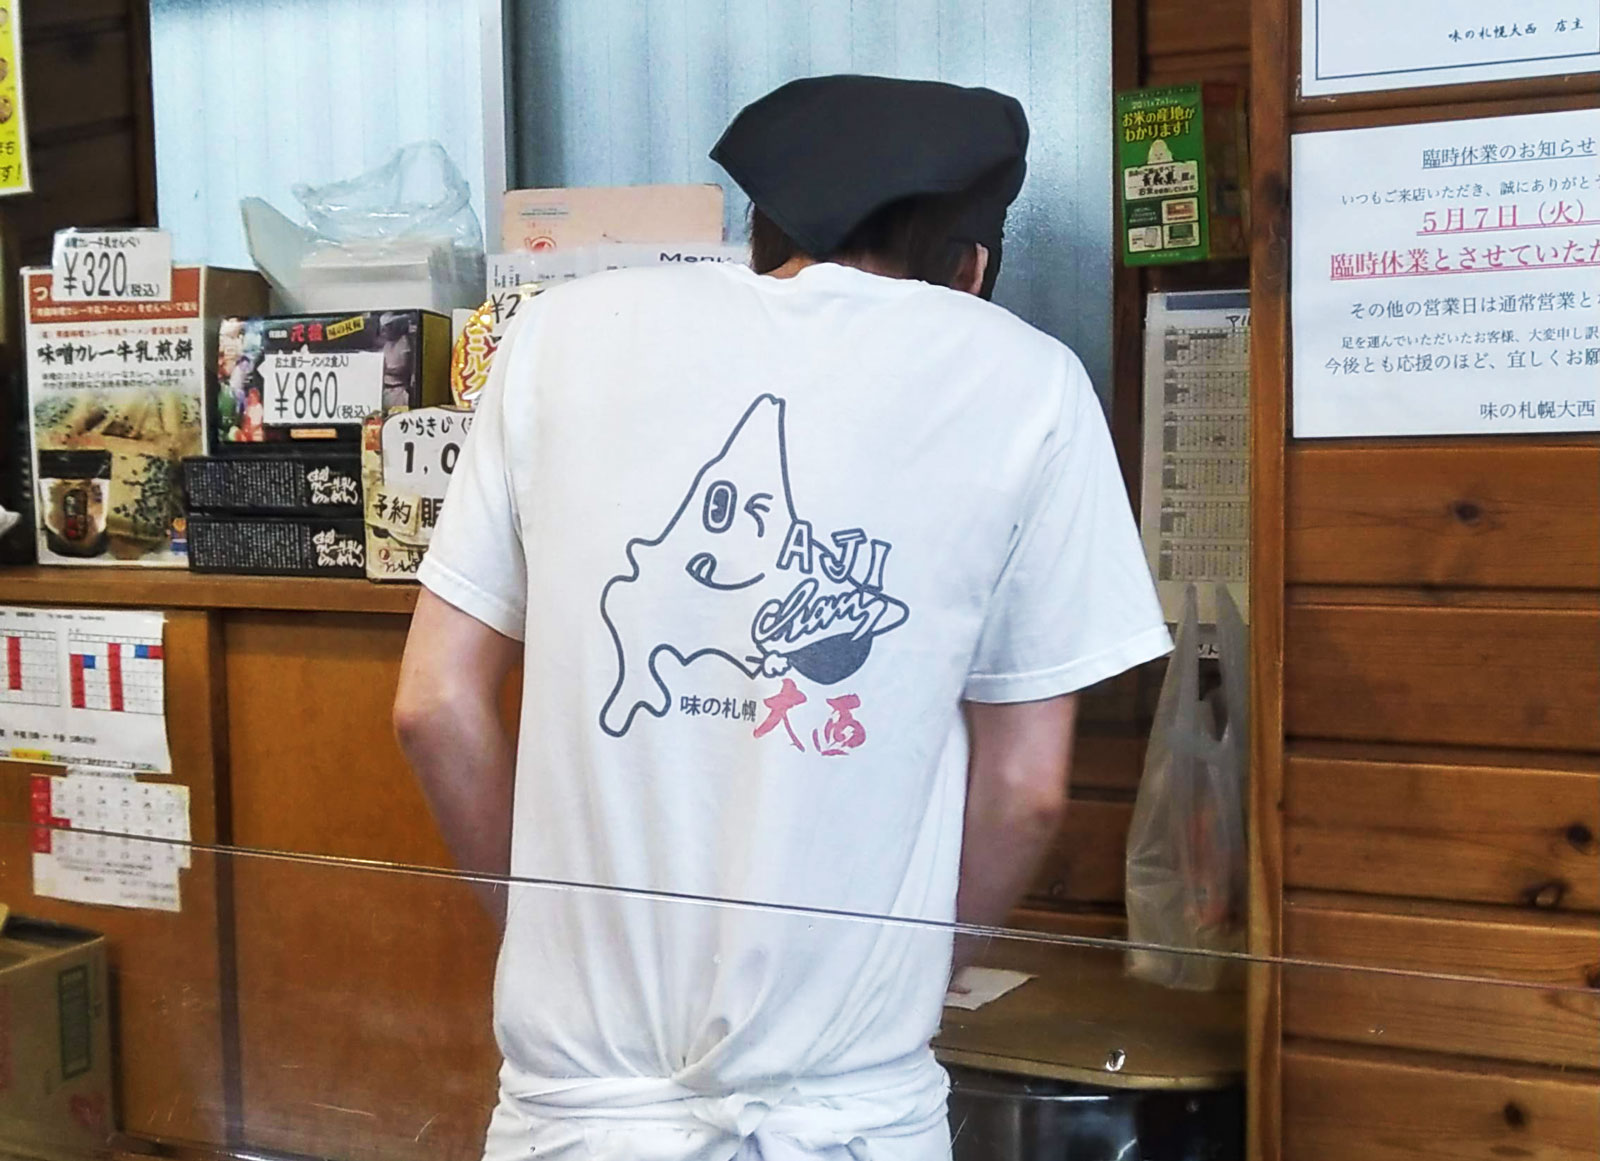 T-shits of Aji no Sapporo